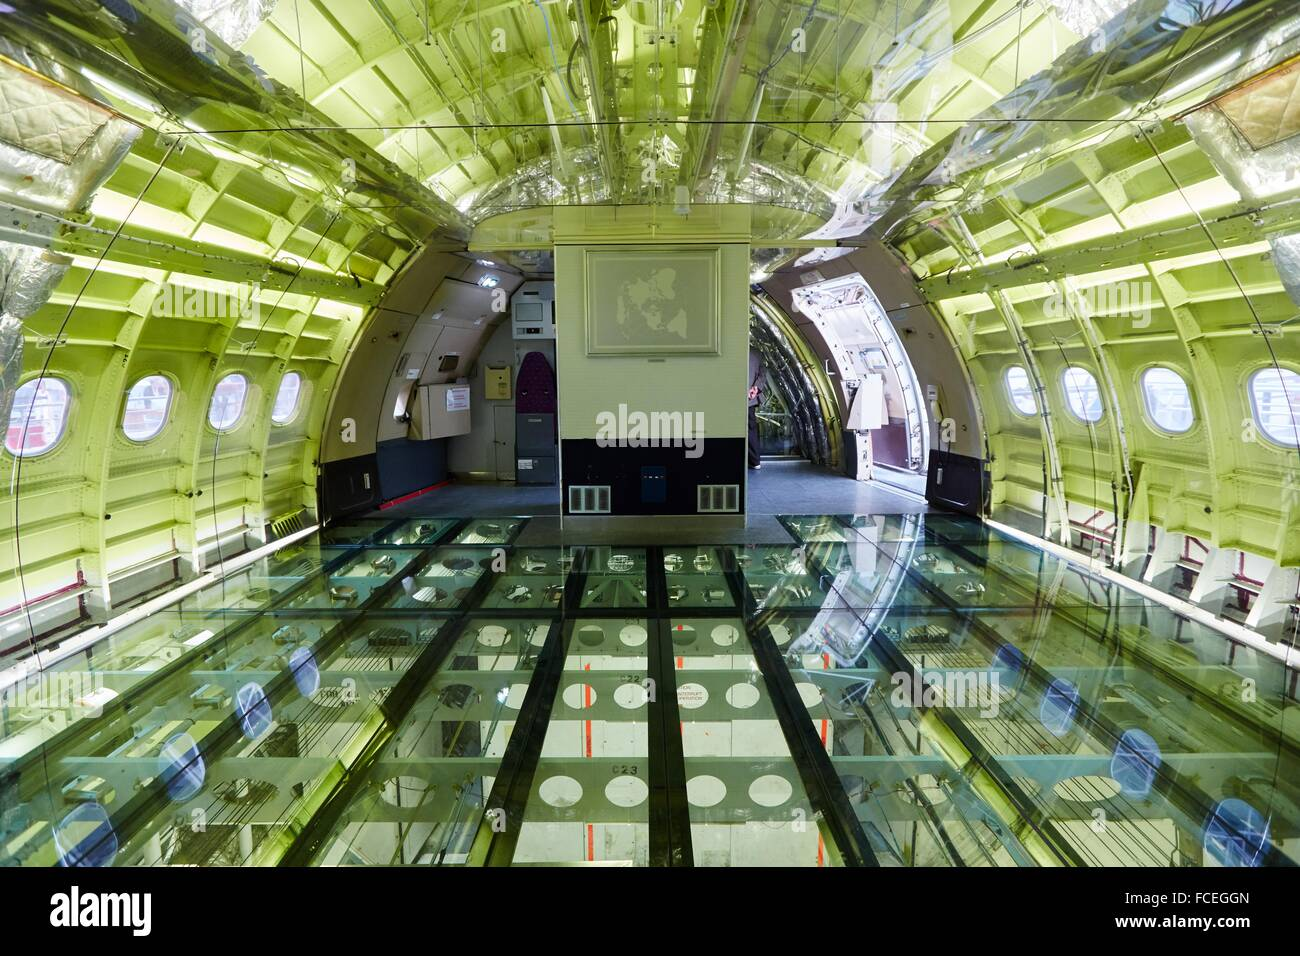 Airbus A300B aircraft. Aeroscopia. Aeronautical Museum. Toulouse. Haute Garonne. France. - Stock Image